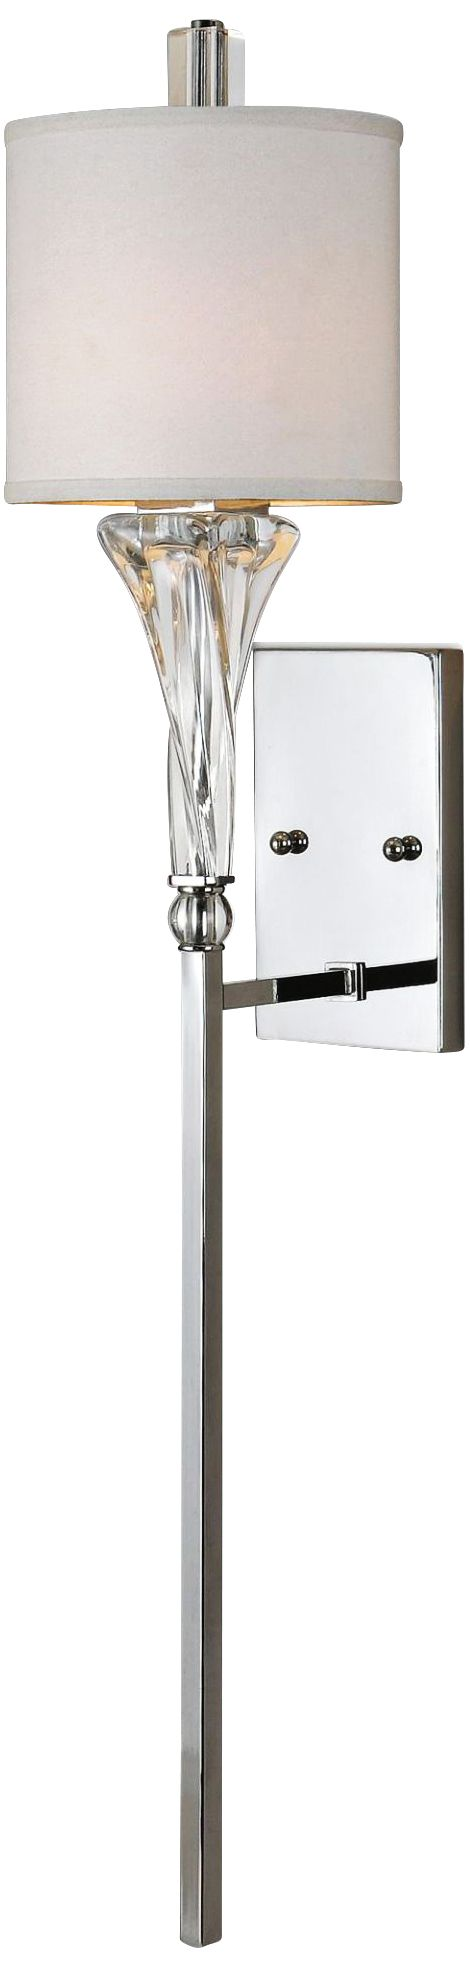 uttermost grancona 46   high polished chrome wall sconce uttermost contemporary sconces   lamps plus  rh   lampsplus